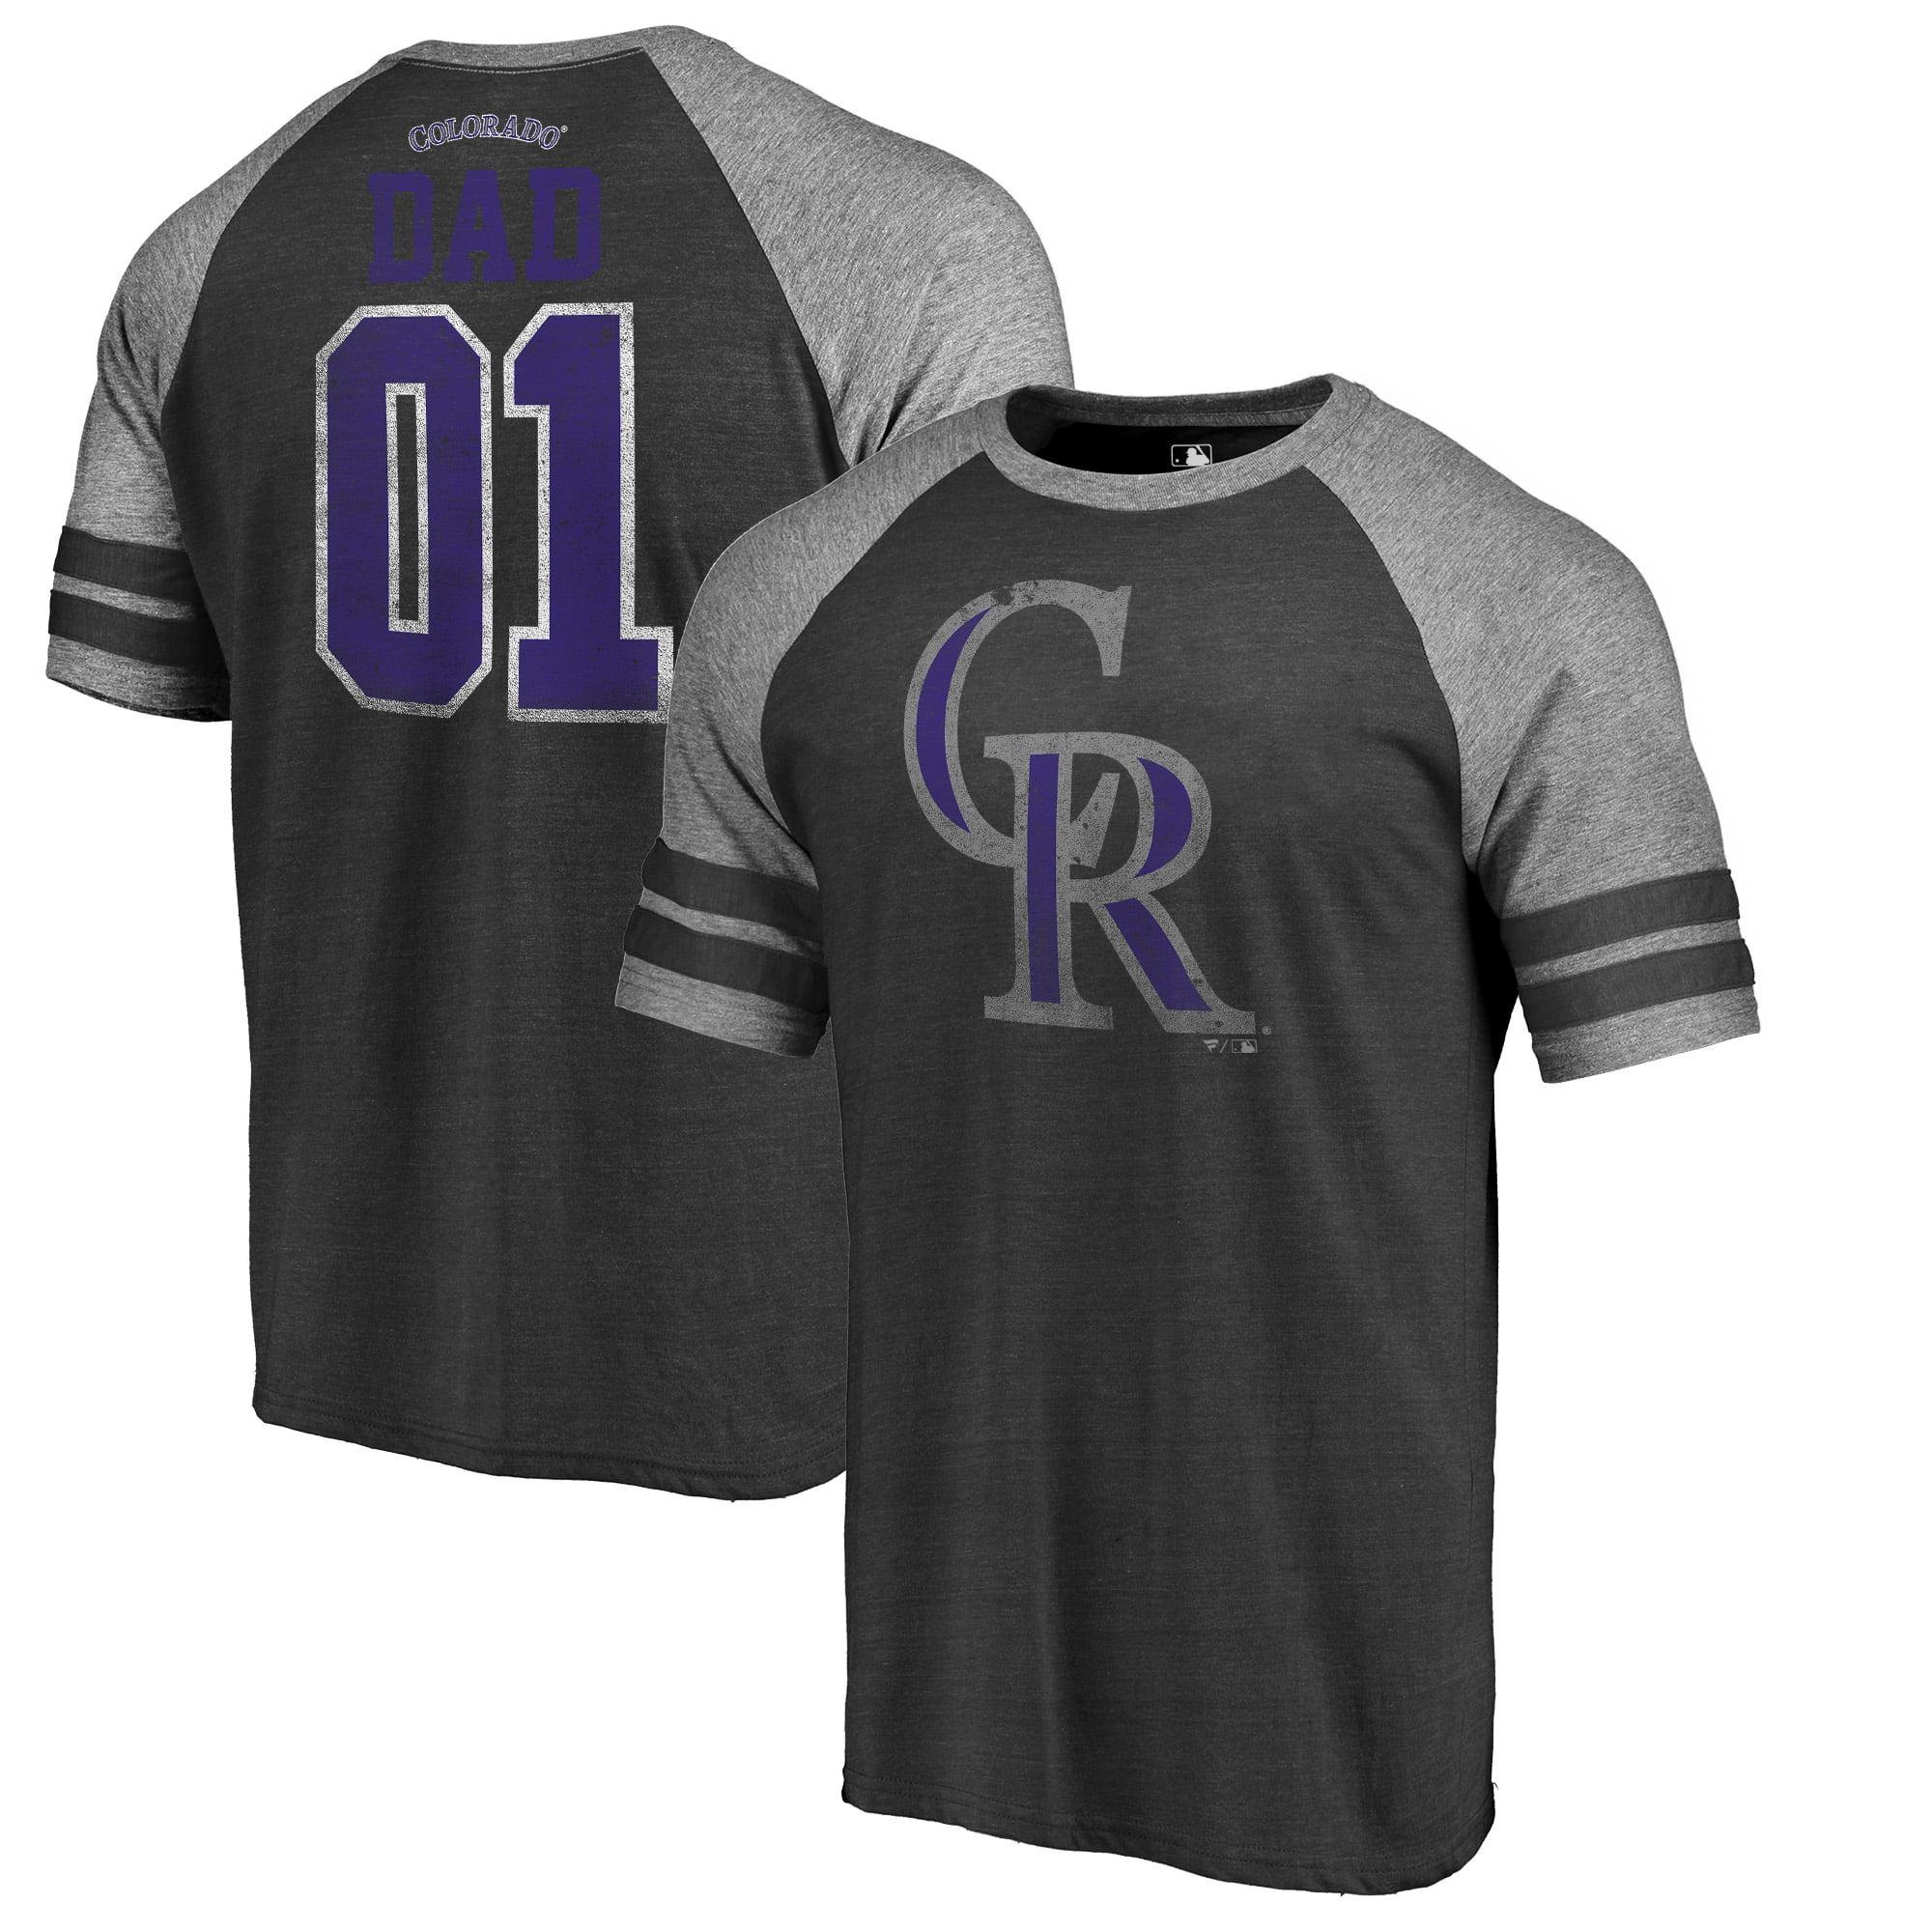 Colorado Rockies Fanatics Branded 2018 Father's Day Greatest Dad Two Stripe Raglan Tri-Blend T-Shirt - Black